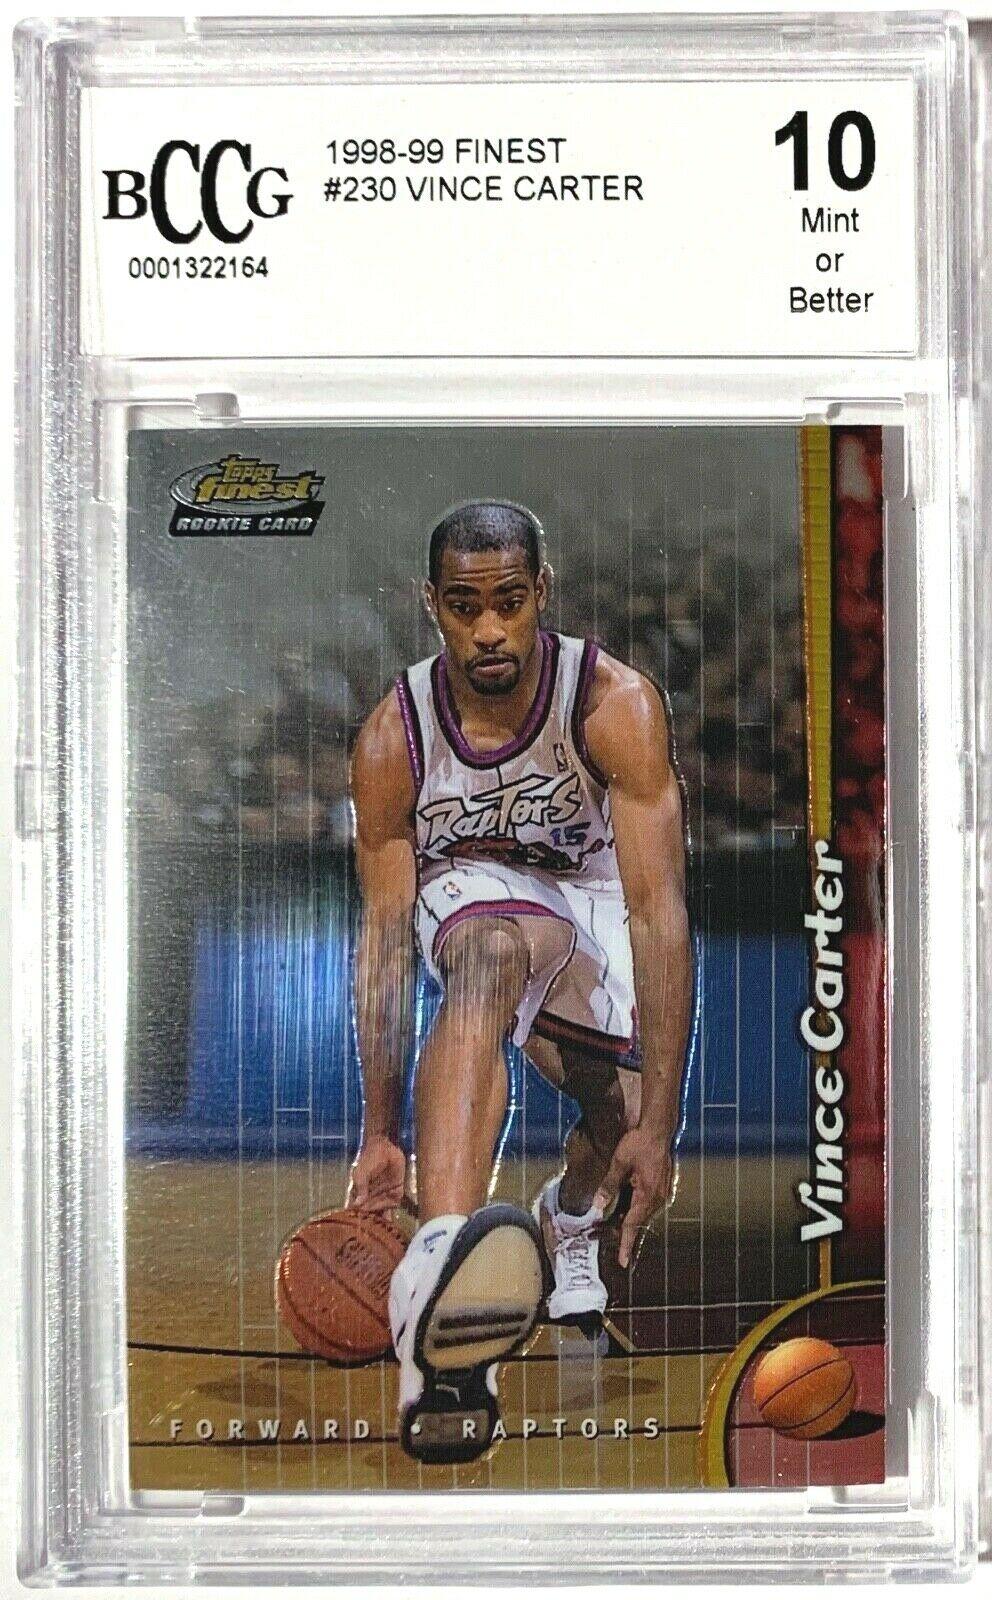 1998-99 Topps Finest Vince Carter #230 PSA 9 Rookie